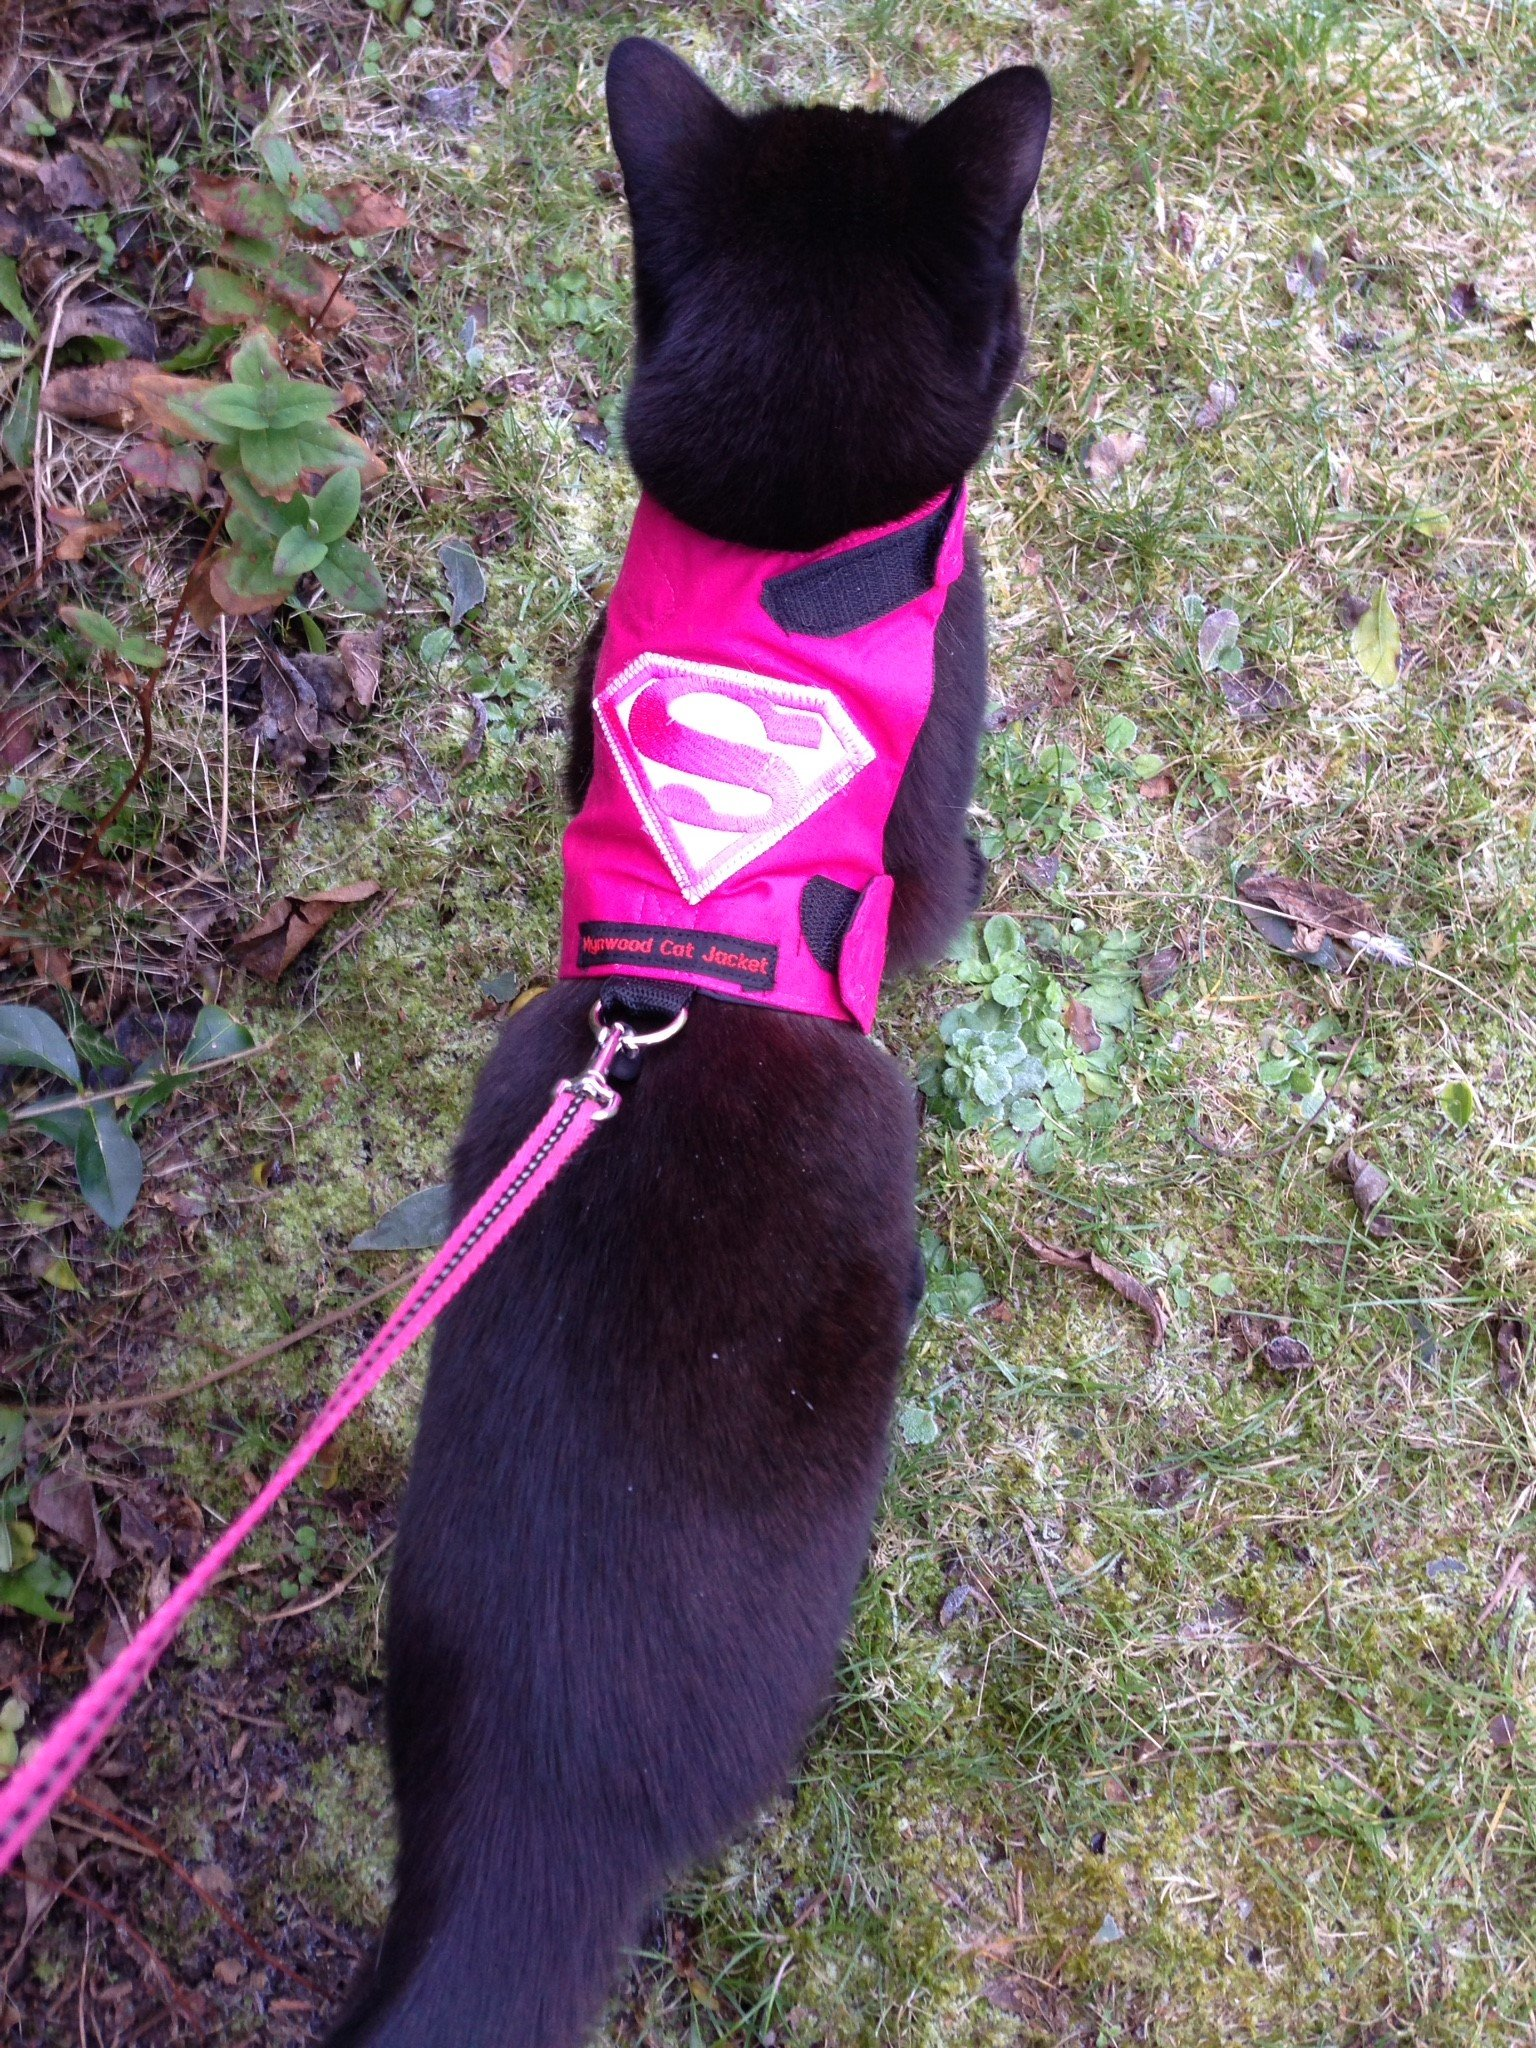 Mynwood Cat Jacket//Harness Skulls Adult Cat